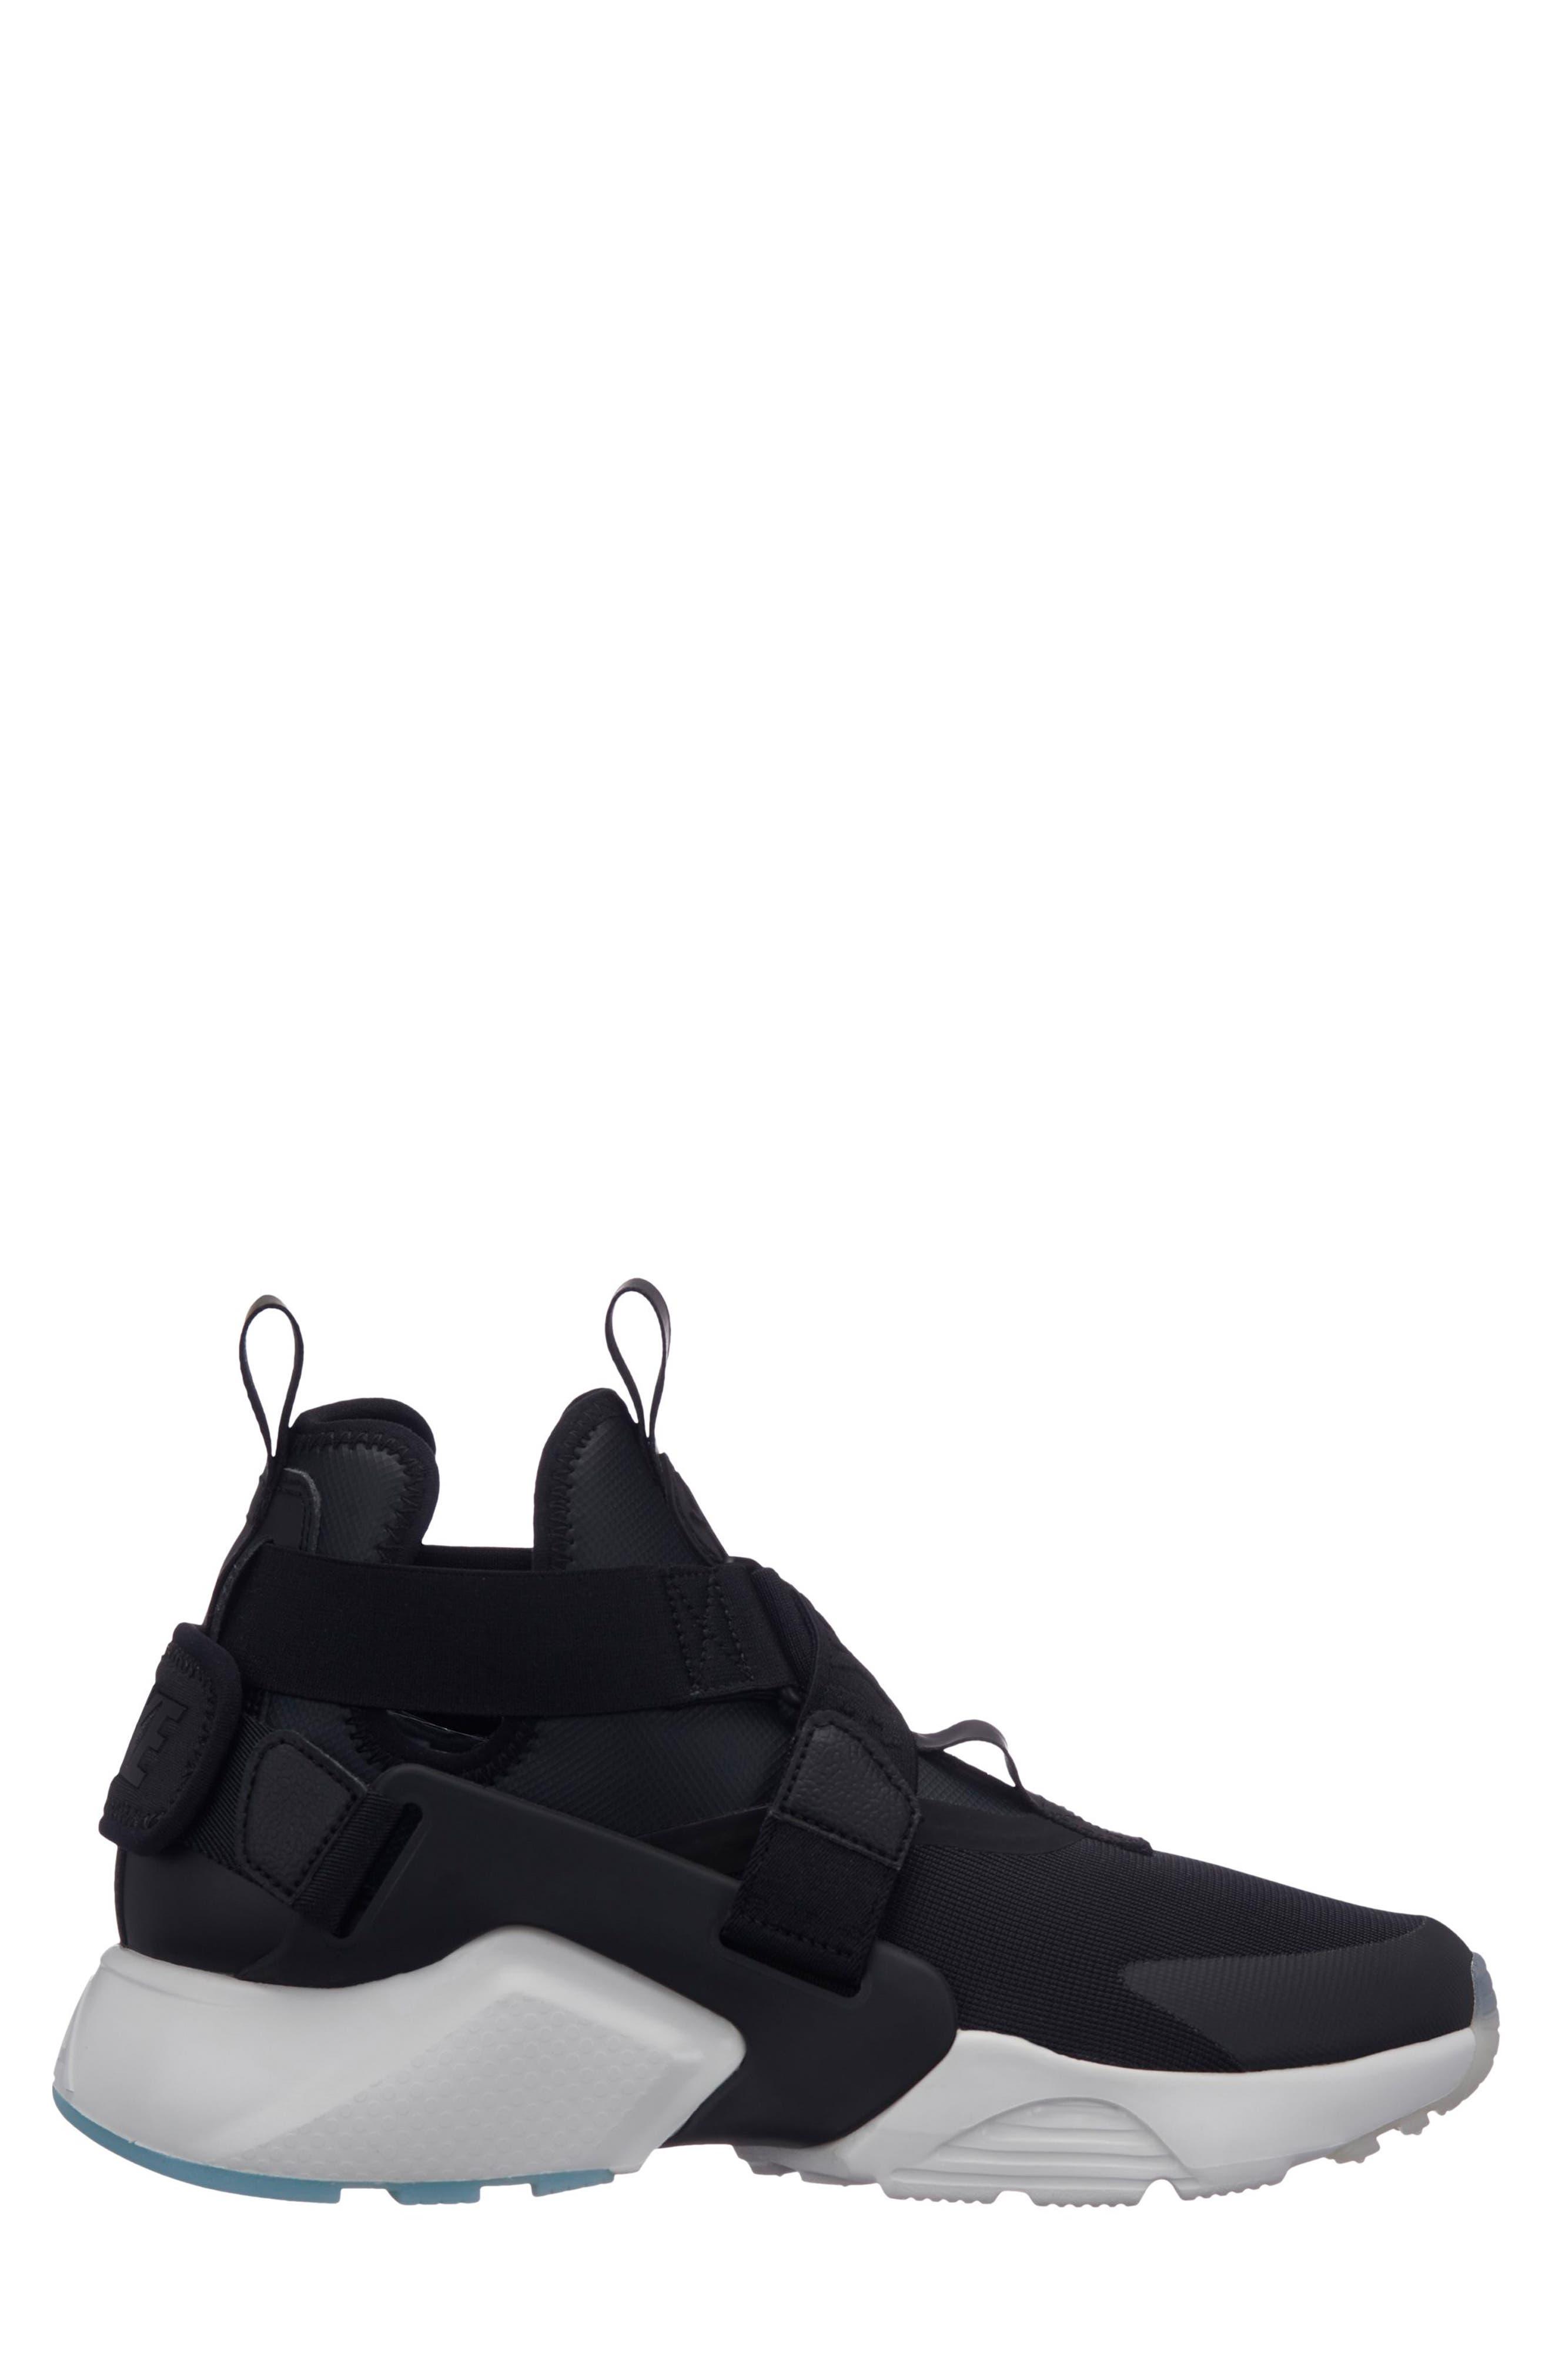 NIKE Air Huarache City Sneaker, Main, color, BLACK/ BLACK/ WHITE/ ICE